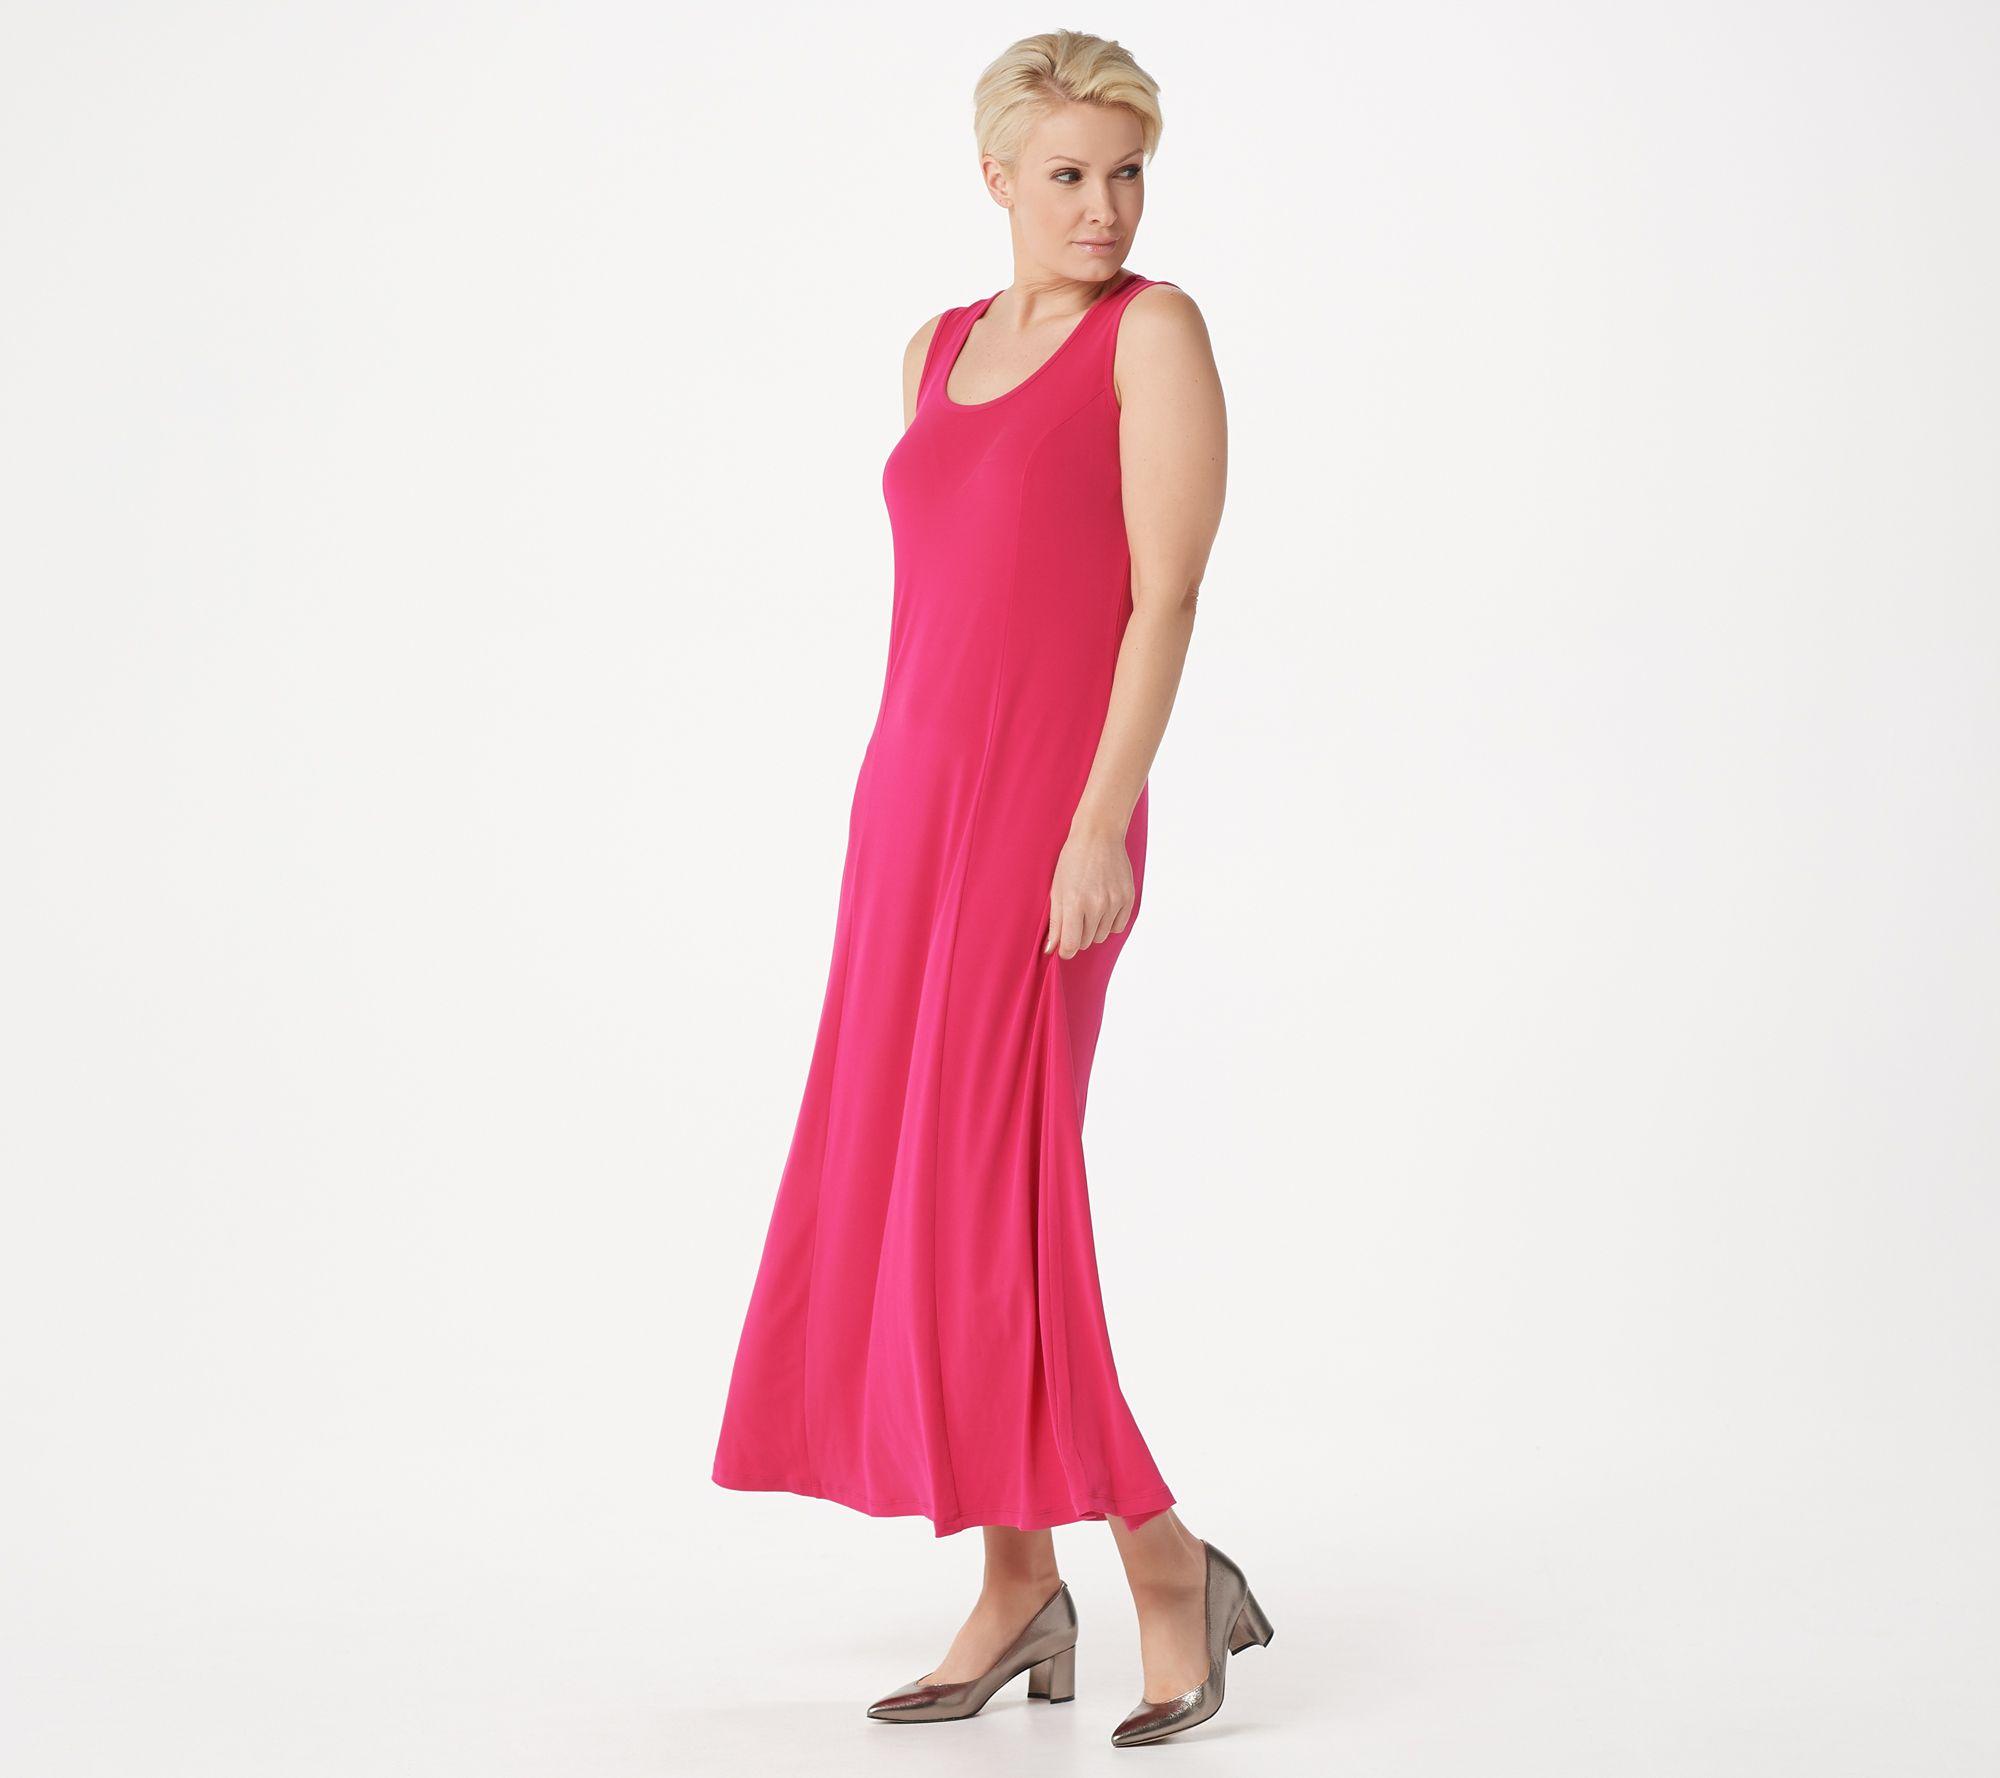 d7e21d04 Susan Graver Liquid Knit Sleeveless Maxi Dress - Page 1 — QVC.com